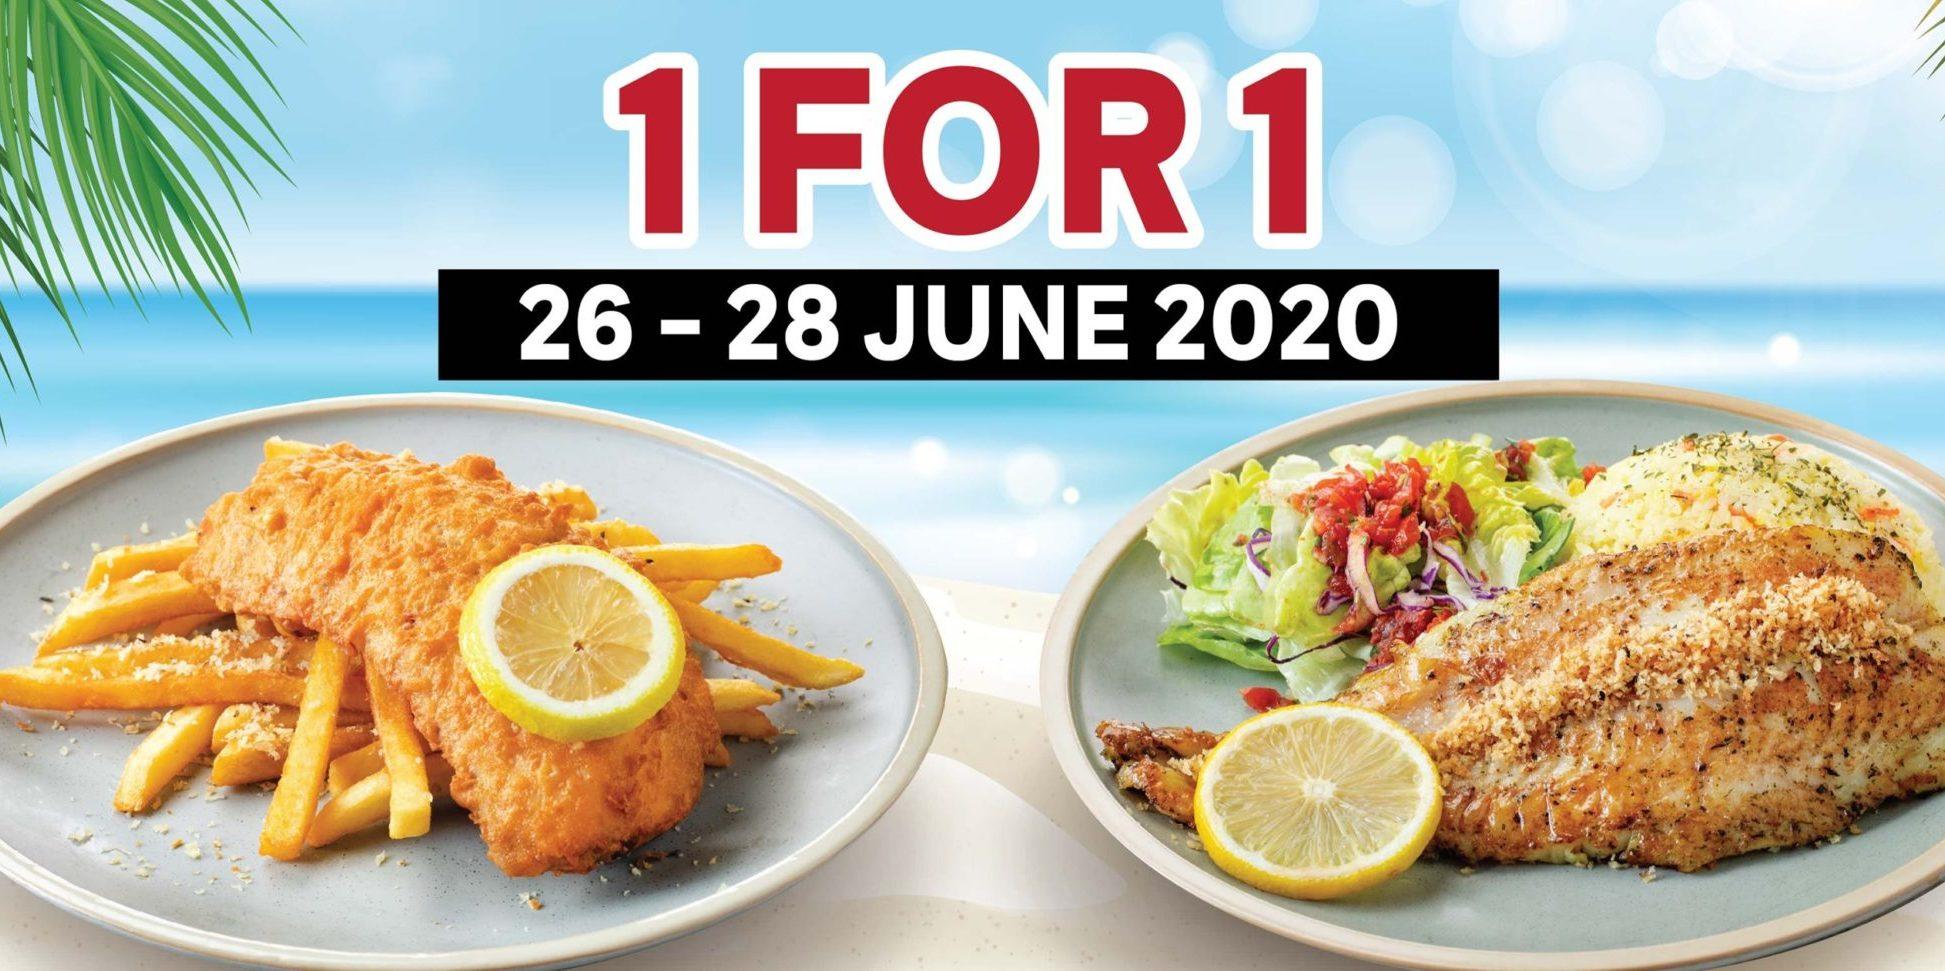 The Manhattan FISH MARKET Singapore 1-for-1 Fish 'n Chips Promotion 26-28 Jun 2020